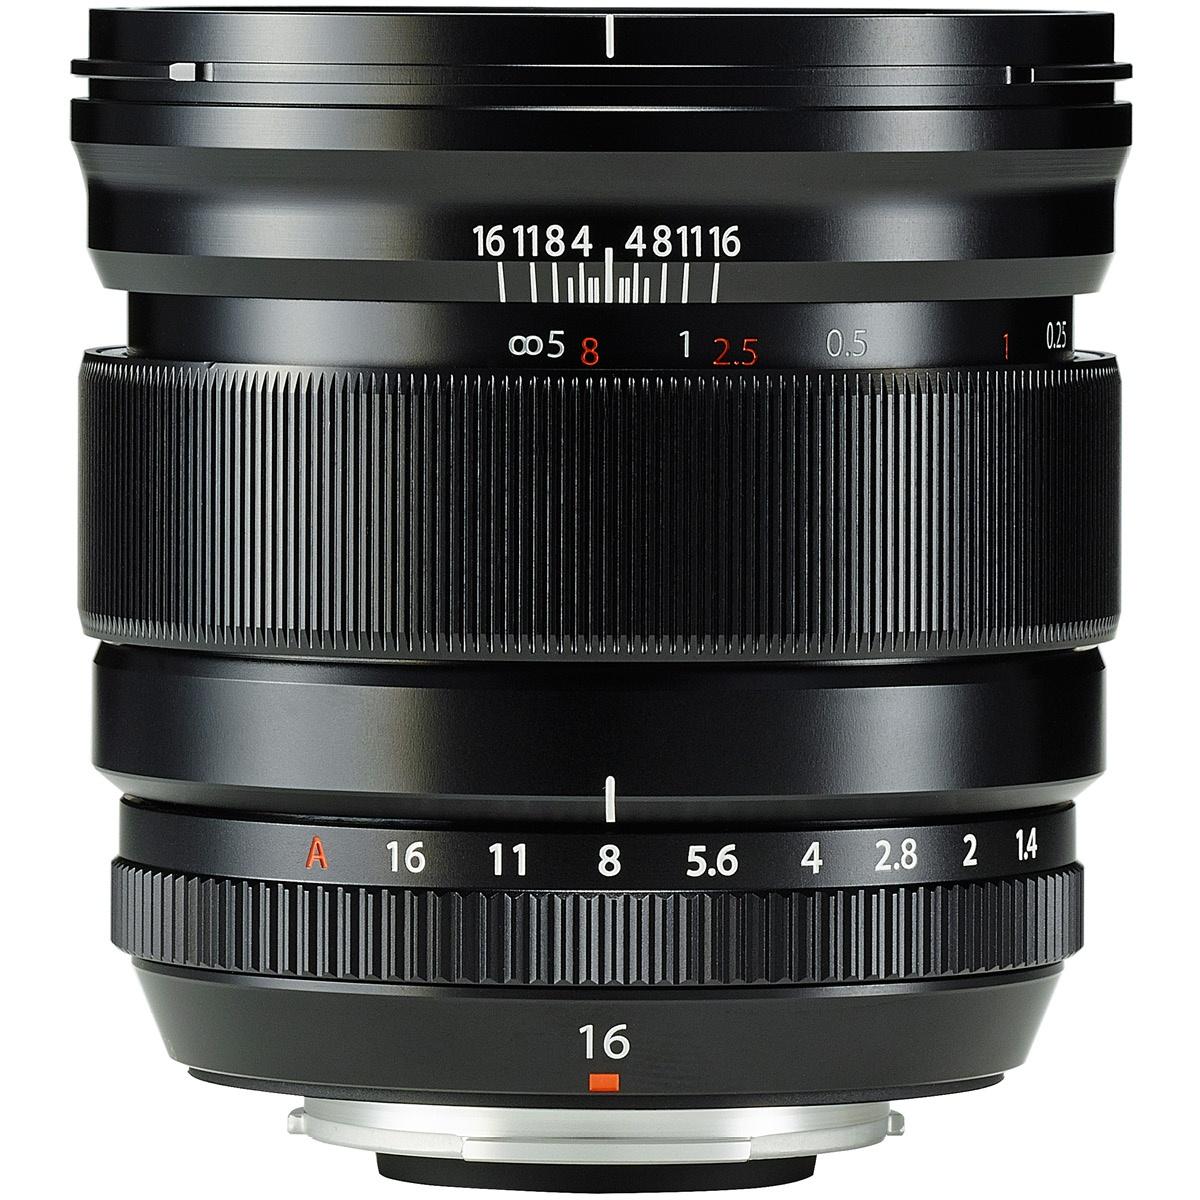 Ott Wyss Ag Fototechnik Olympus Mzuiko Digital Ed 40 150mm F 28 Pro Mc 14 14x Teleconverter 08112018 1114 Bearbeiten Lschen